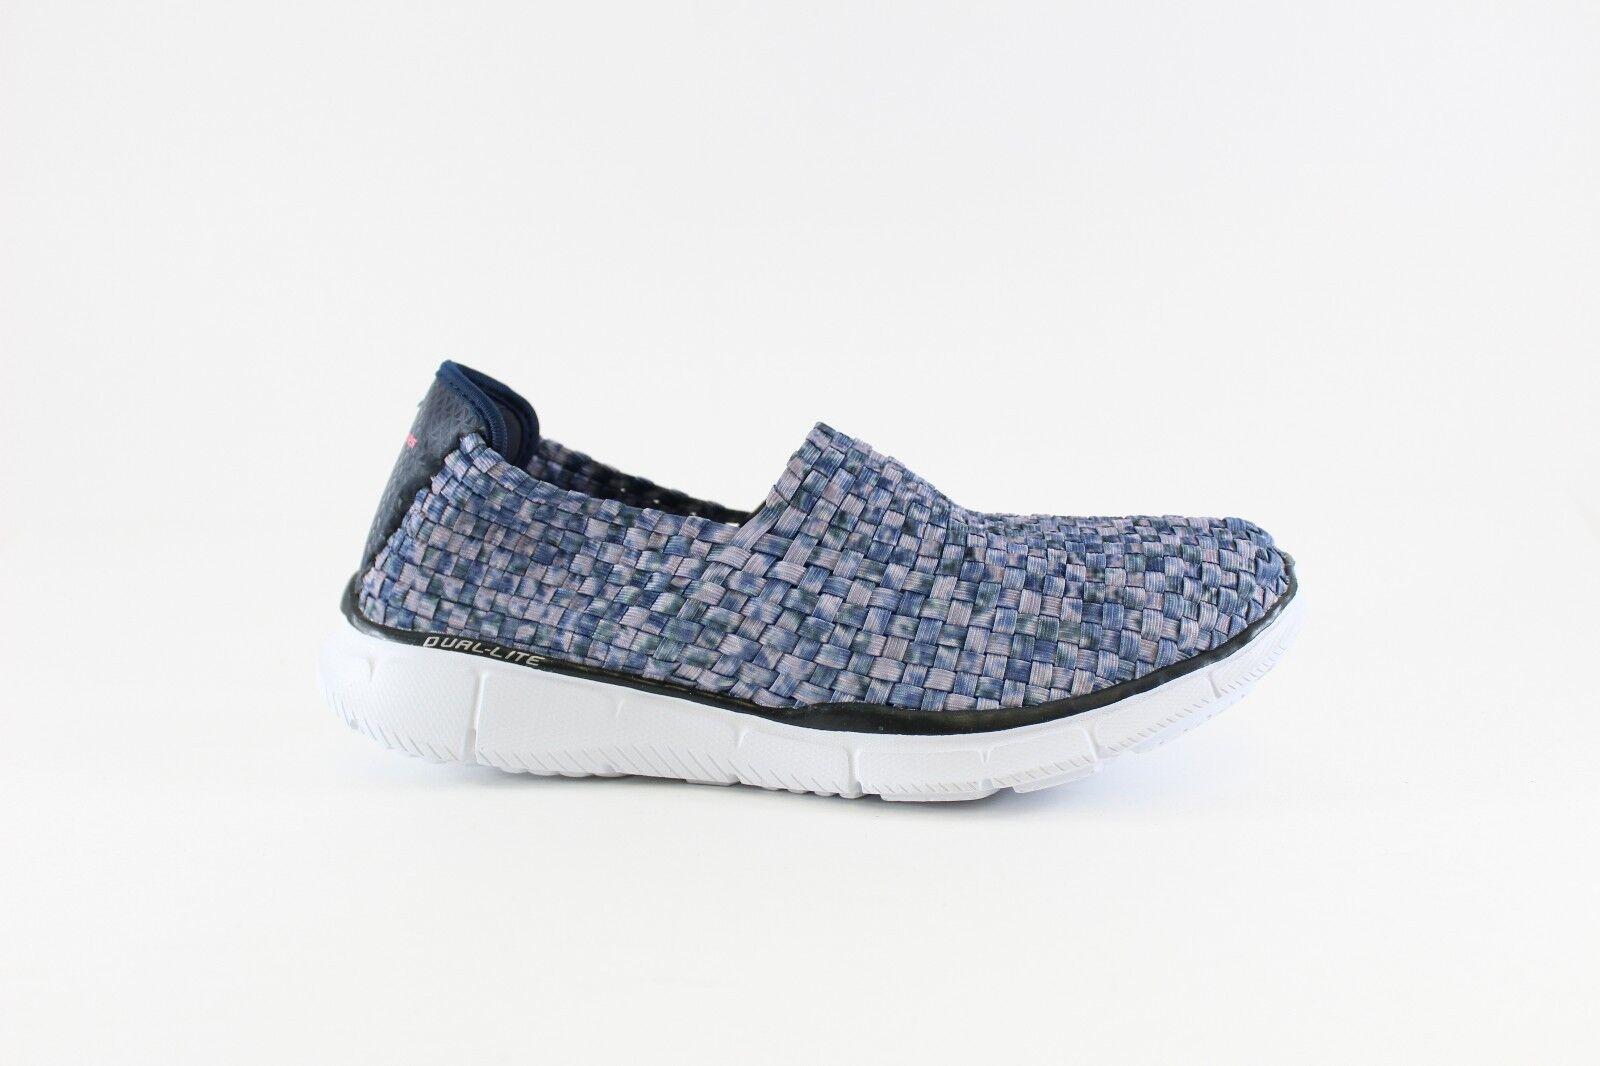 Skechers Sport Women's Vivid Dream Fashion Sneaker,Navy White,11 M US